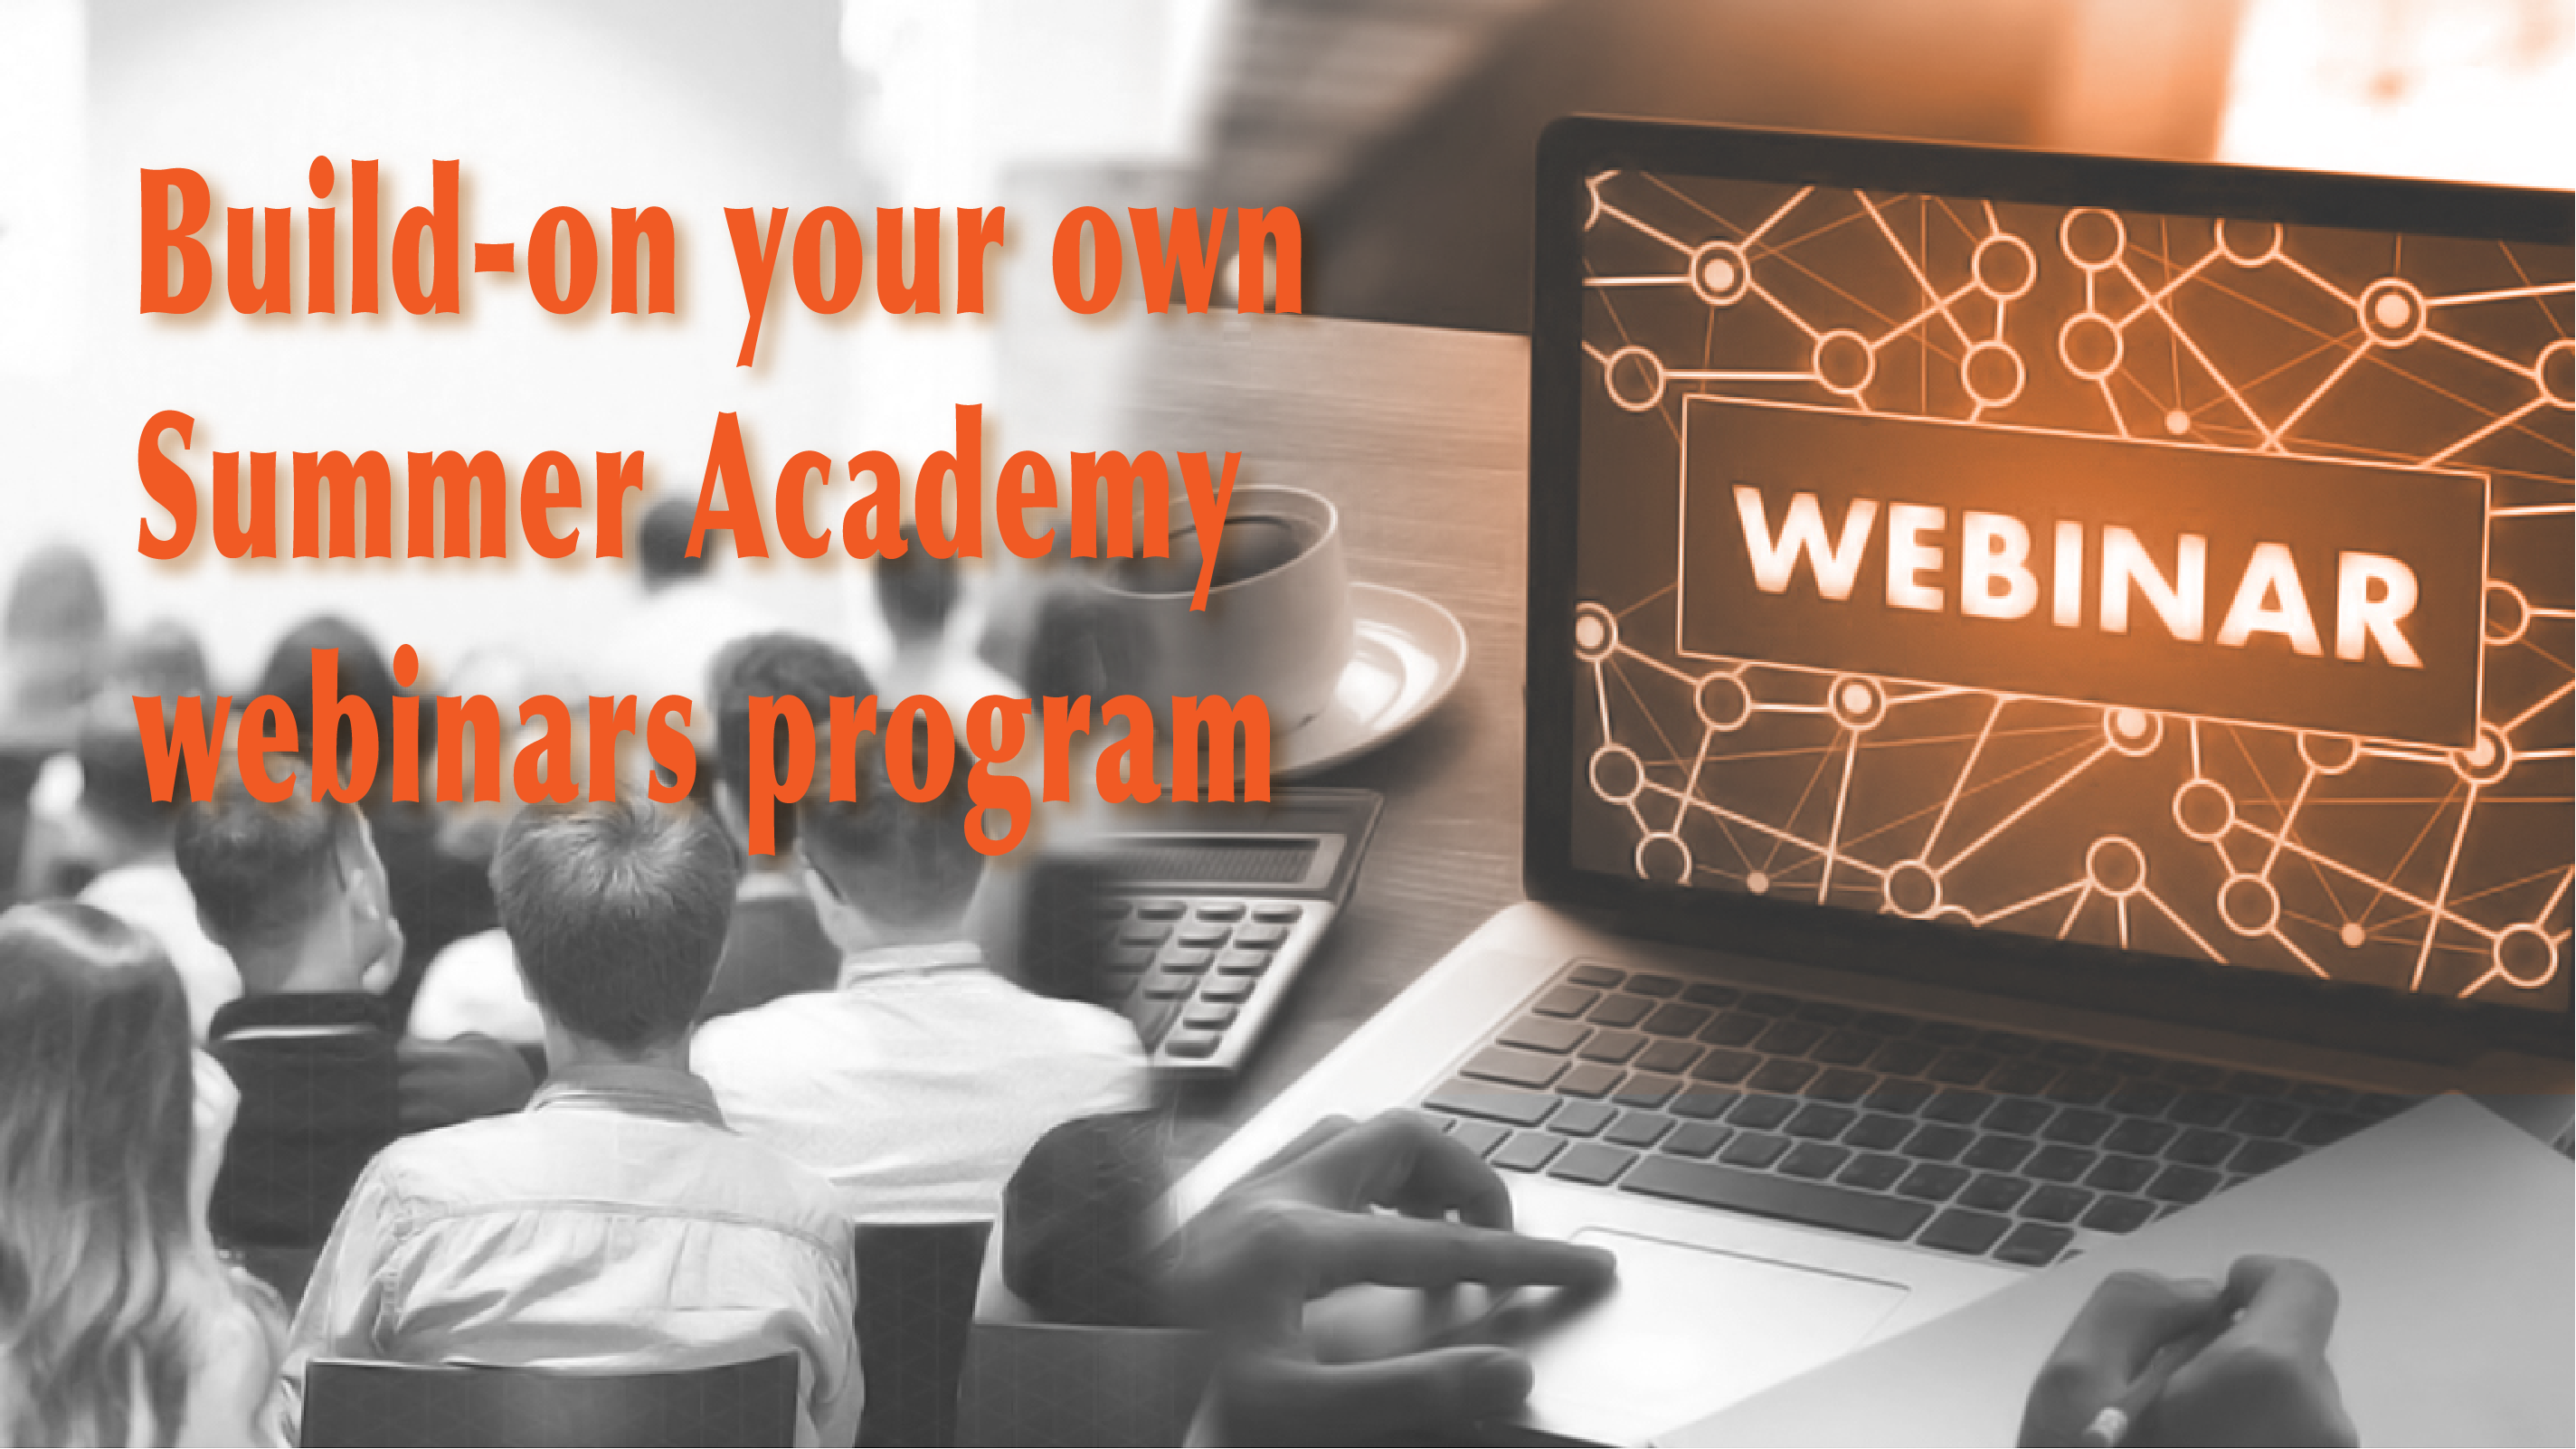 academy webinars program